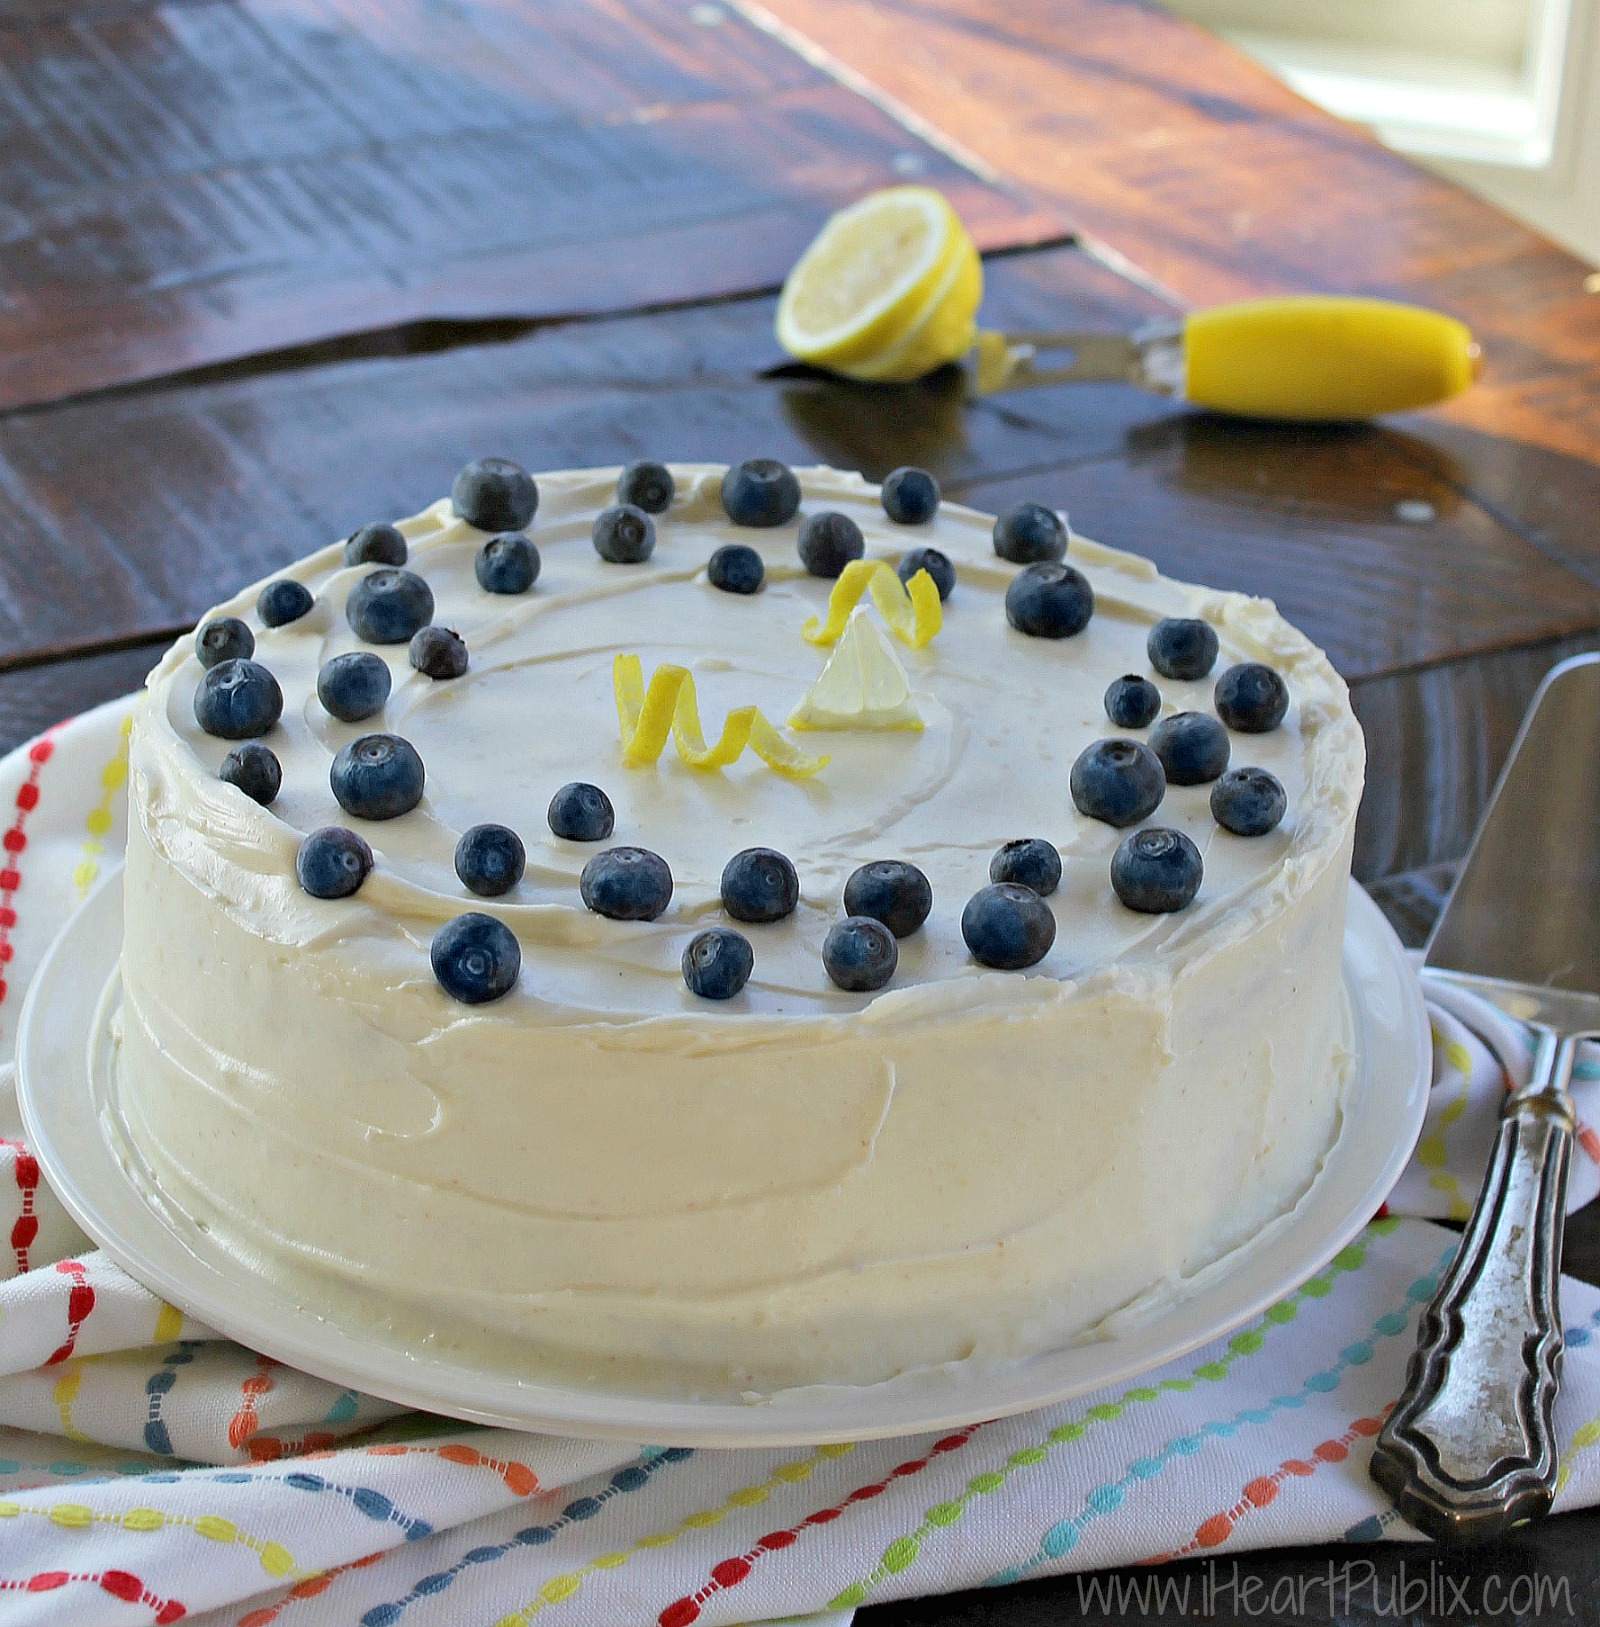 Buttercream Frosted Lemon Blueberry Layer Cake Perfect Dessert For